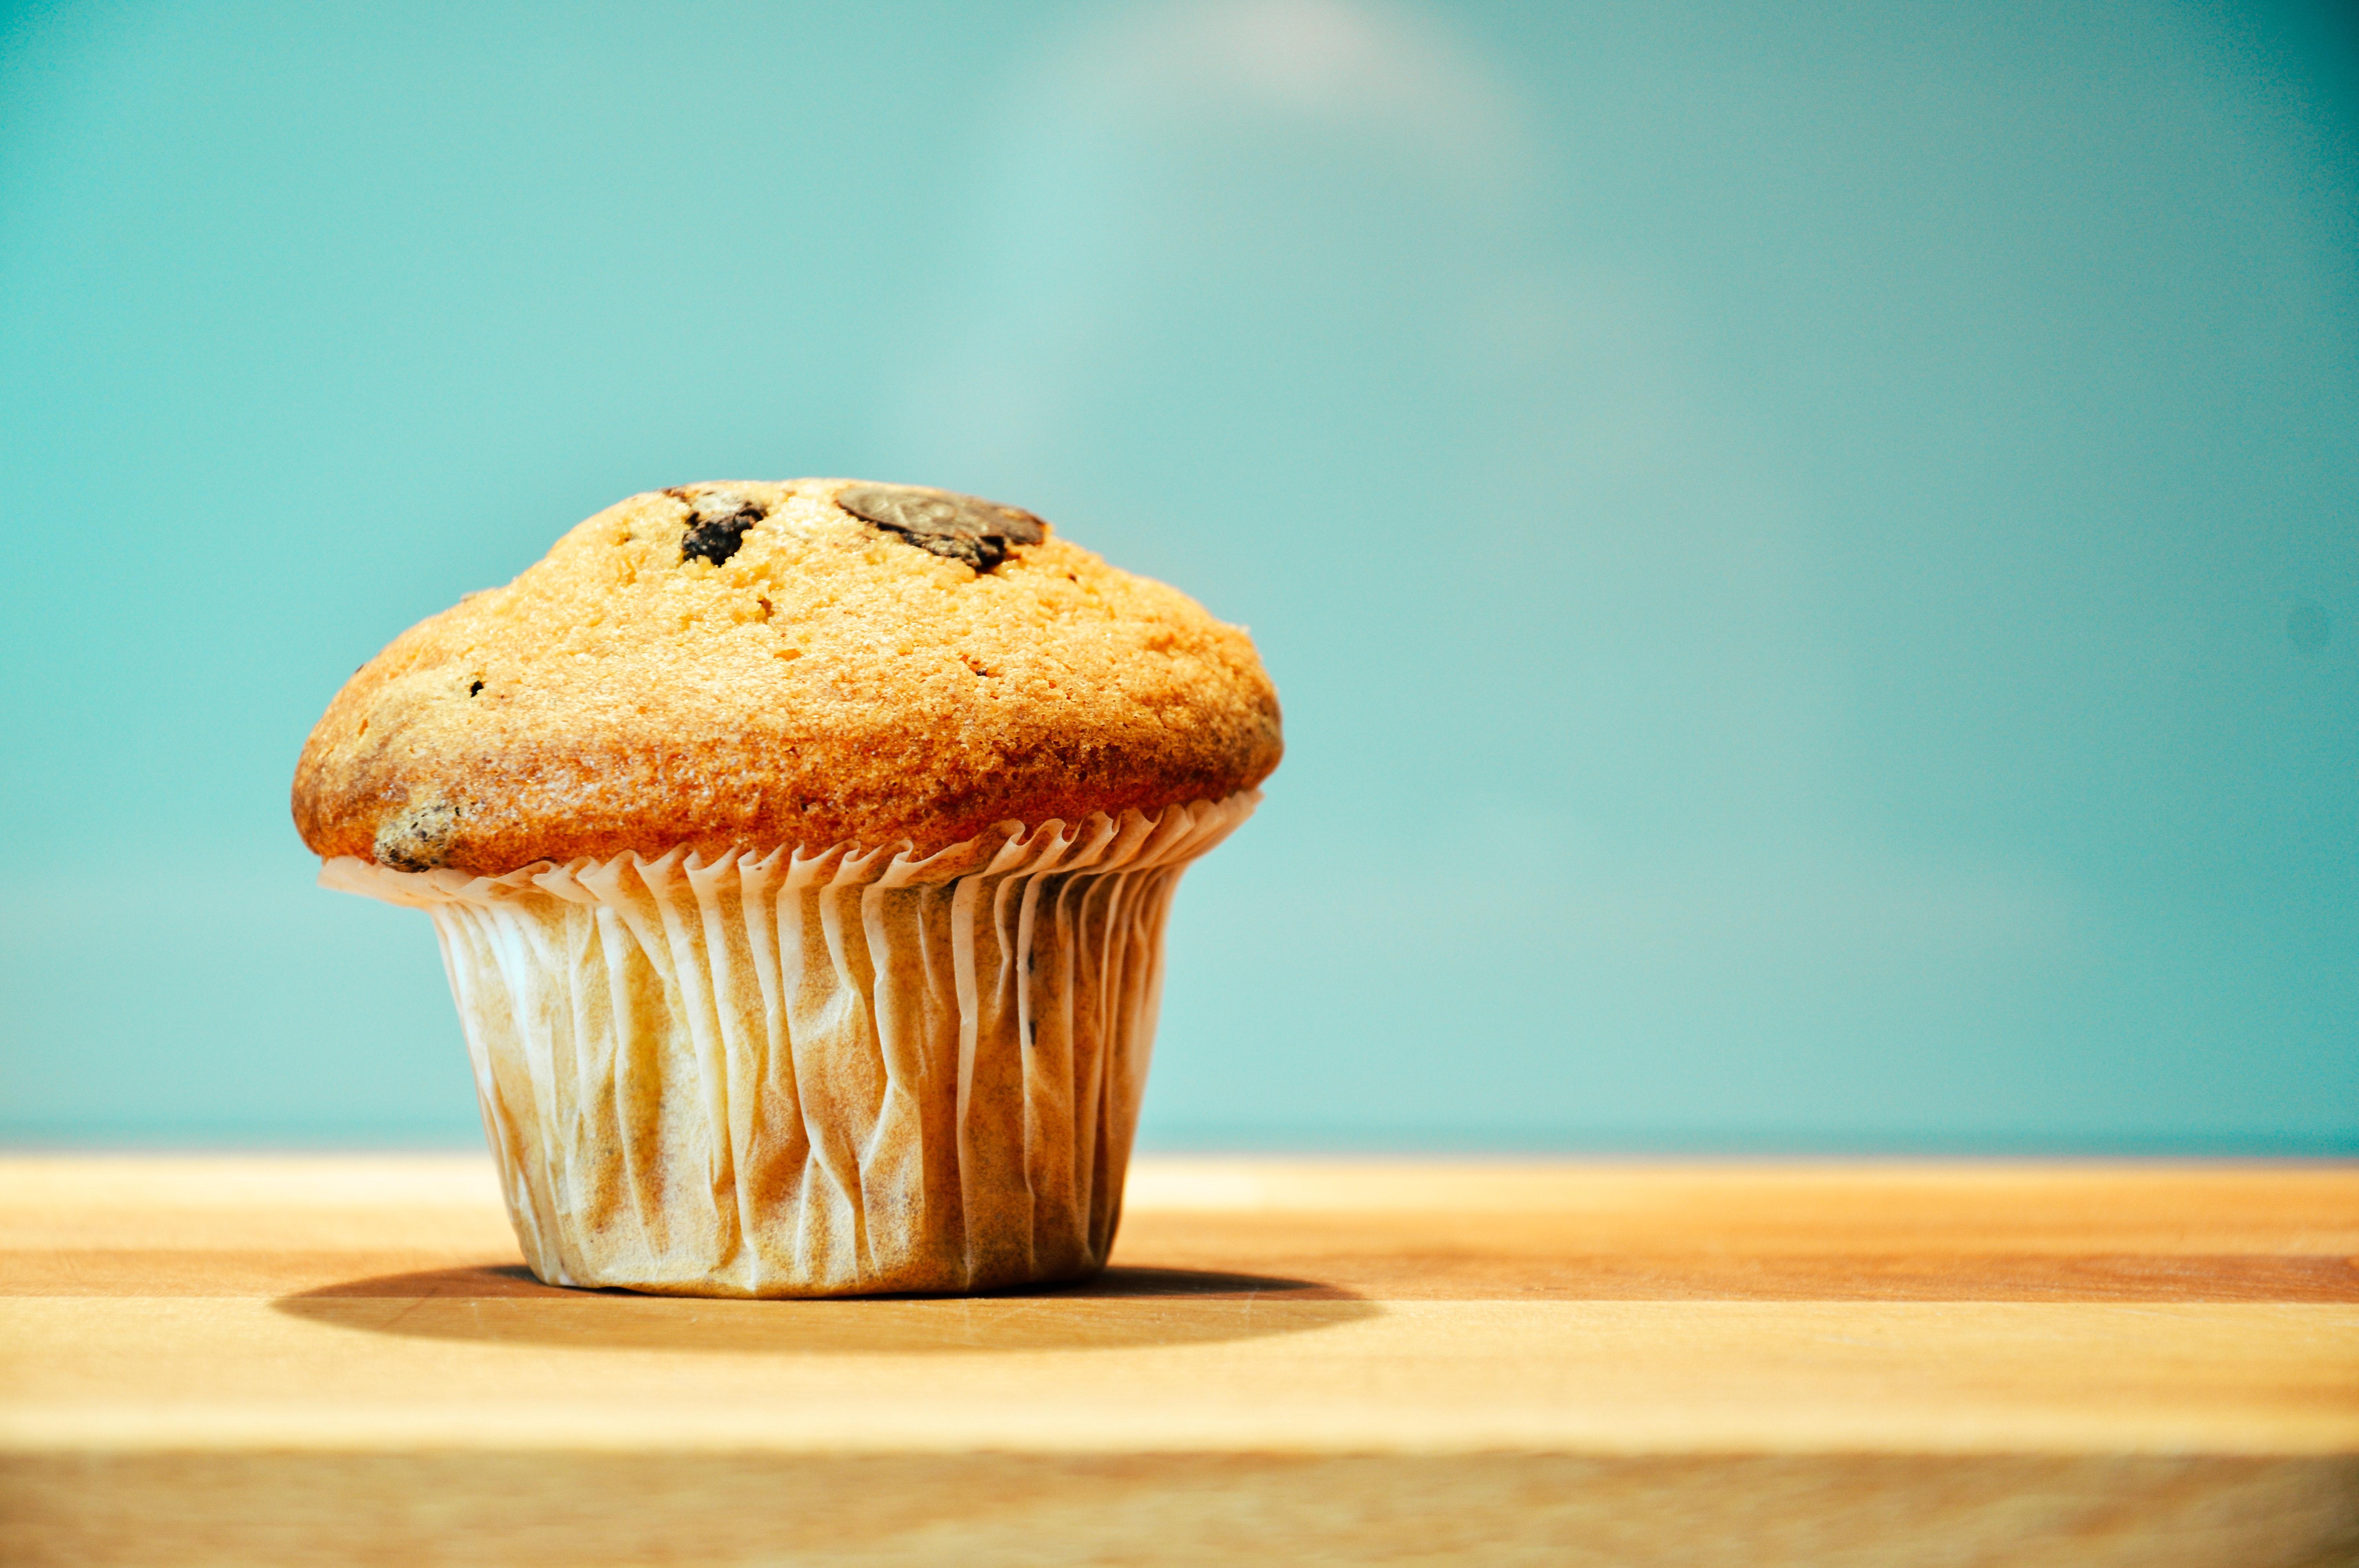 Muffin 183 Free Stock Photo